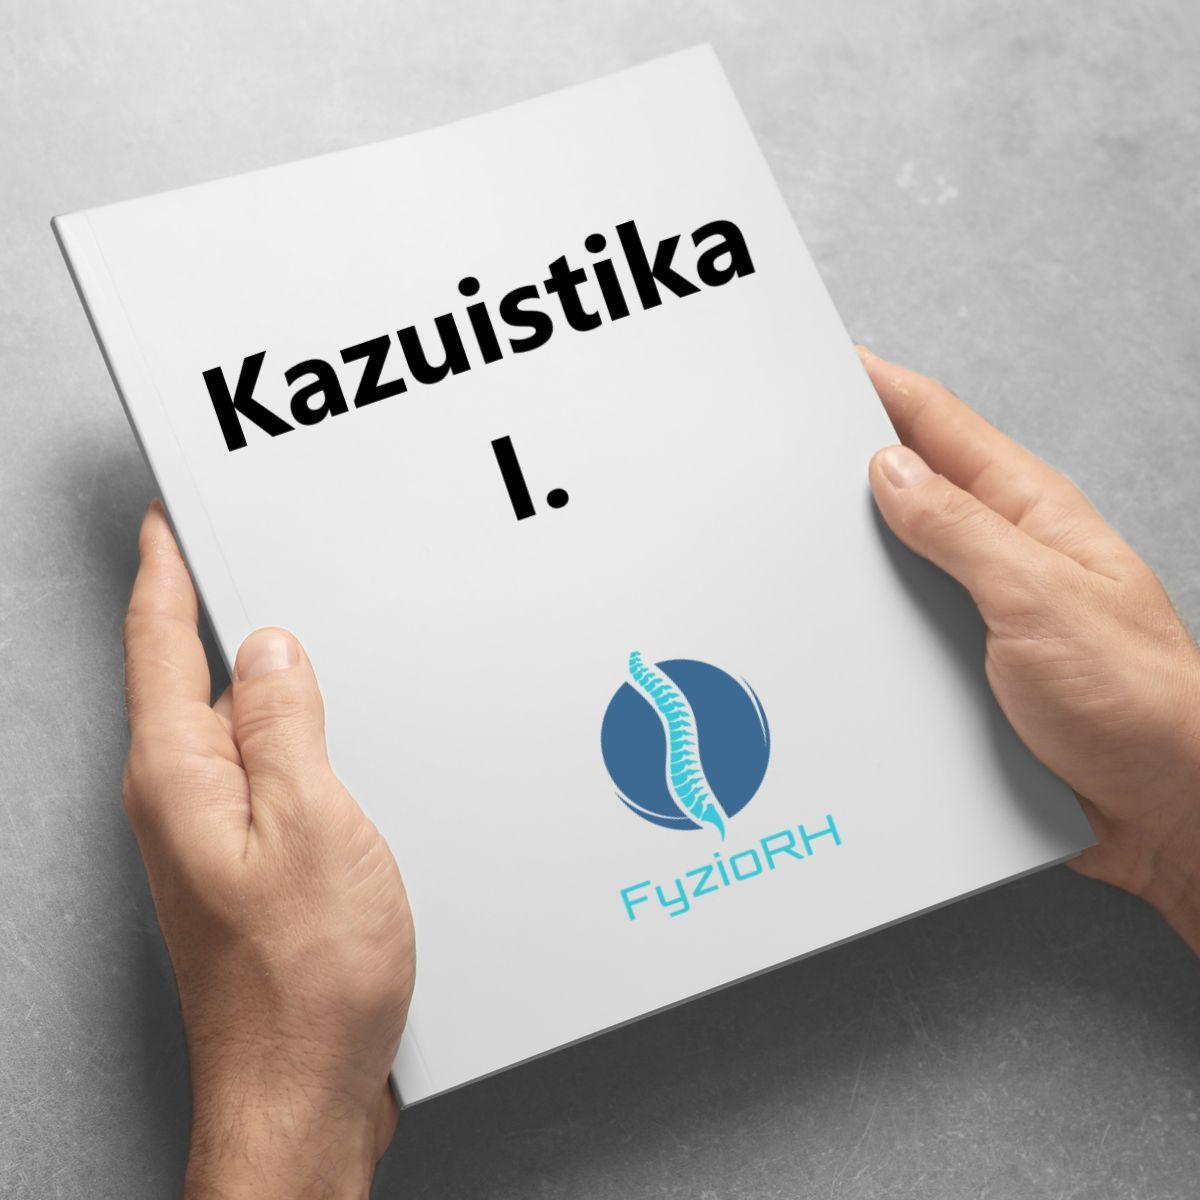 Kazuistika I